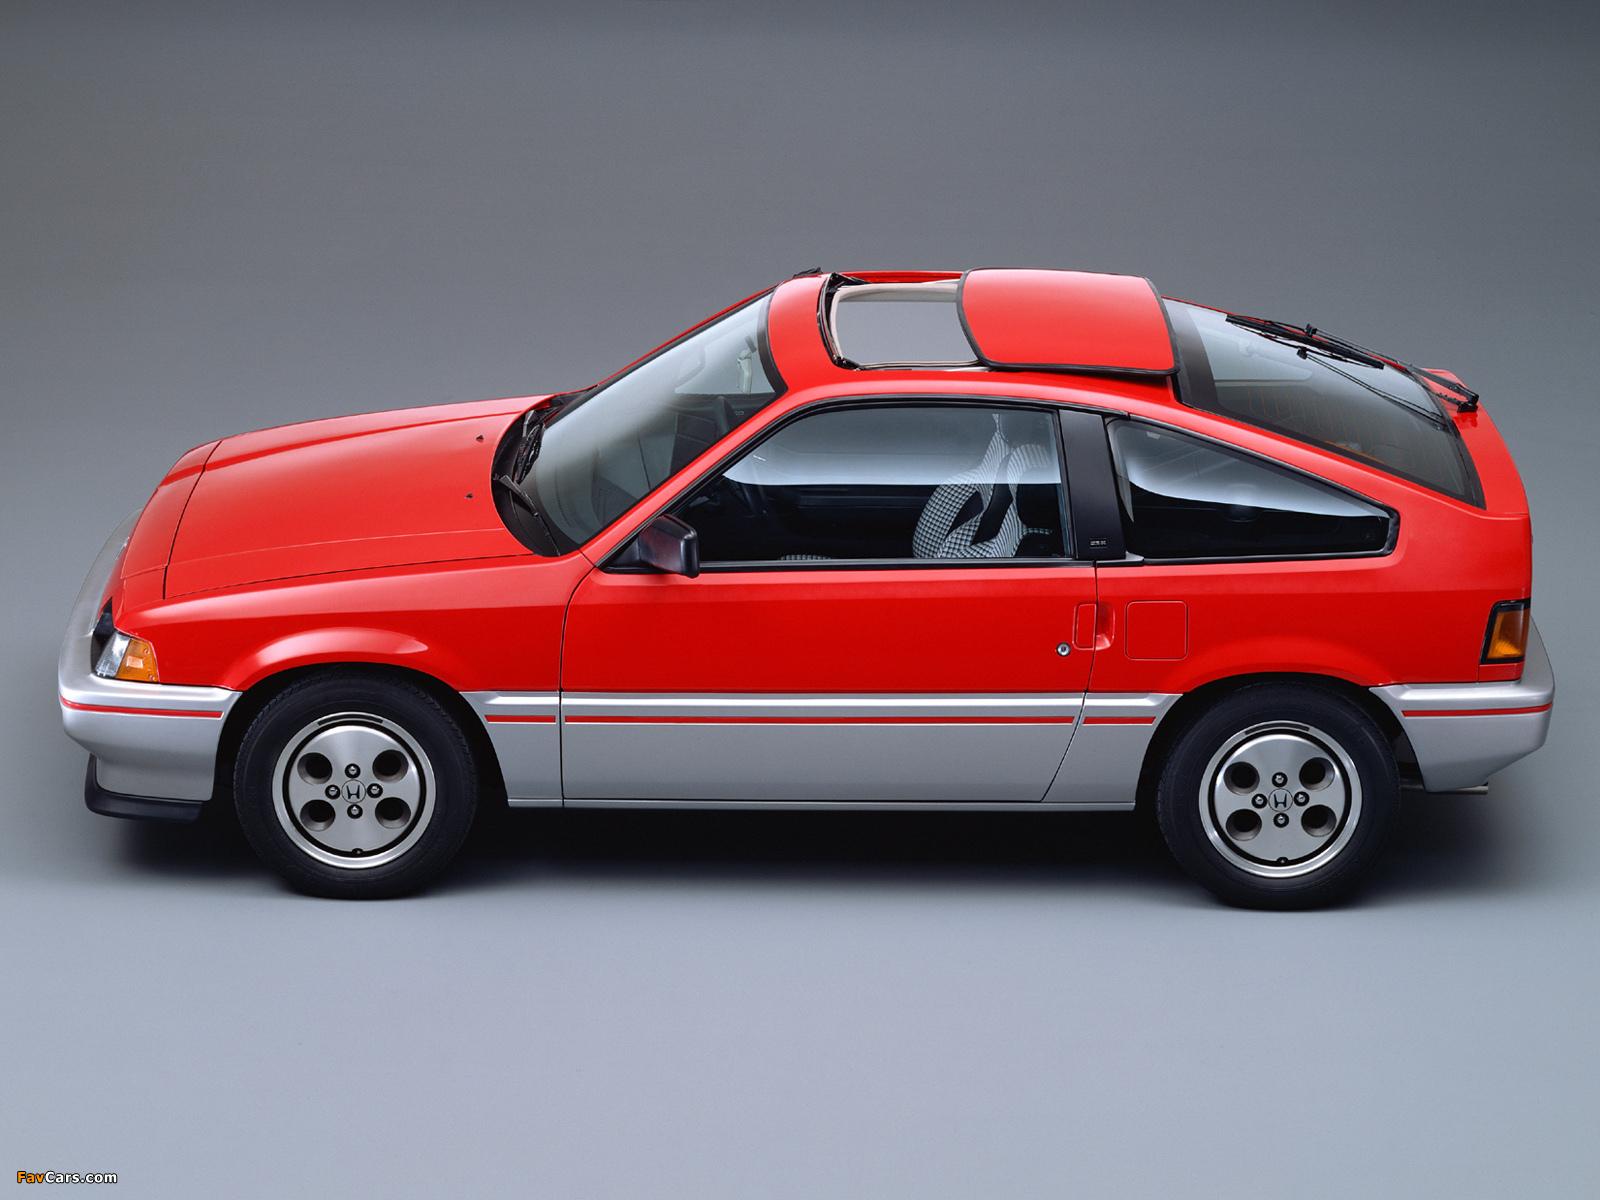 Honda Cr X >> Honda Ballade Sports CR-X 1983–87 pictures (1600x1200)